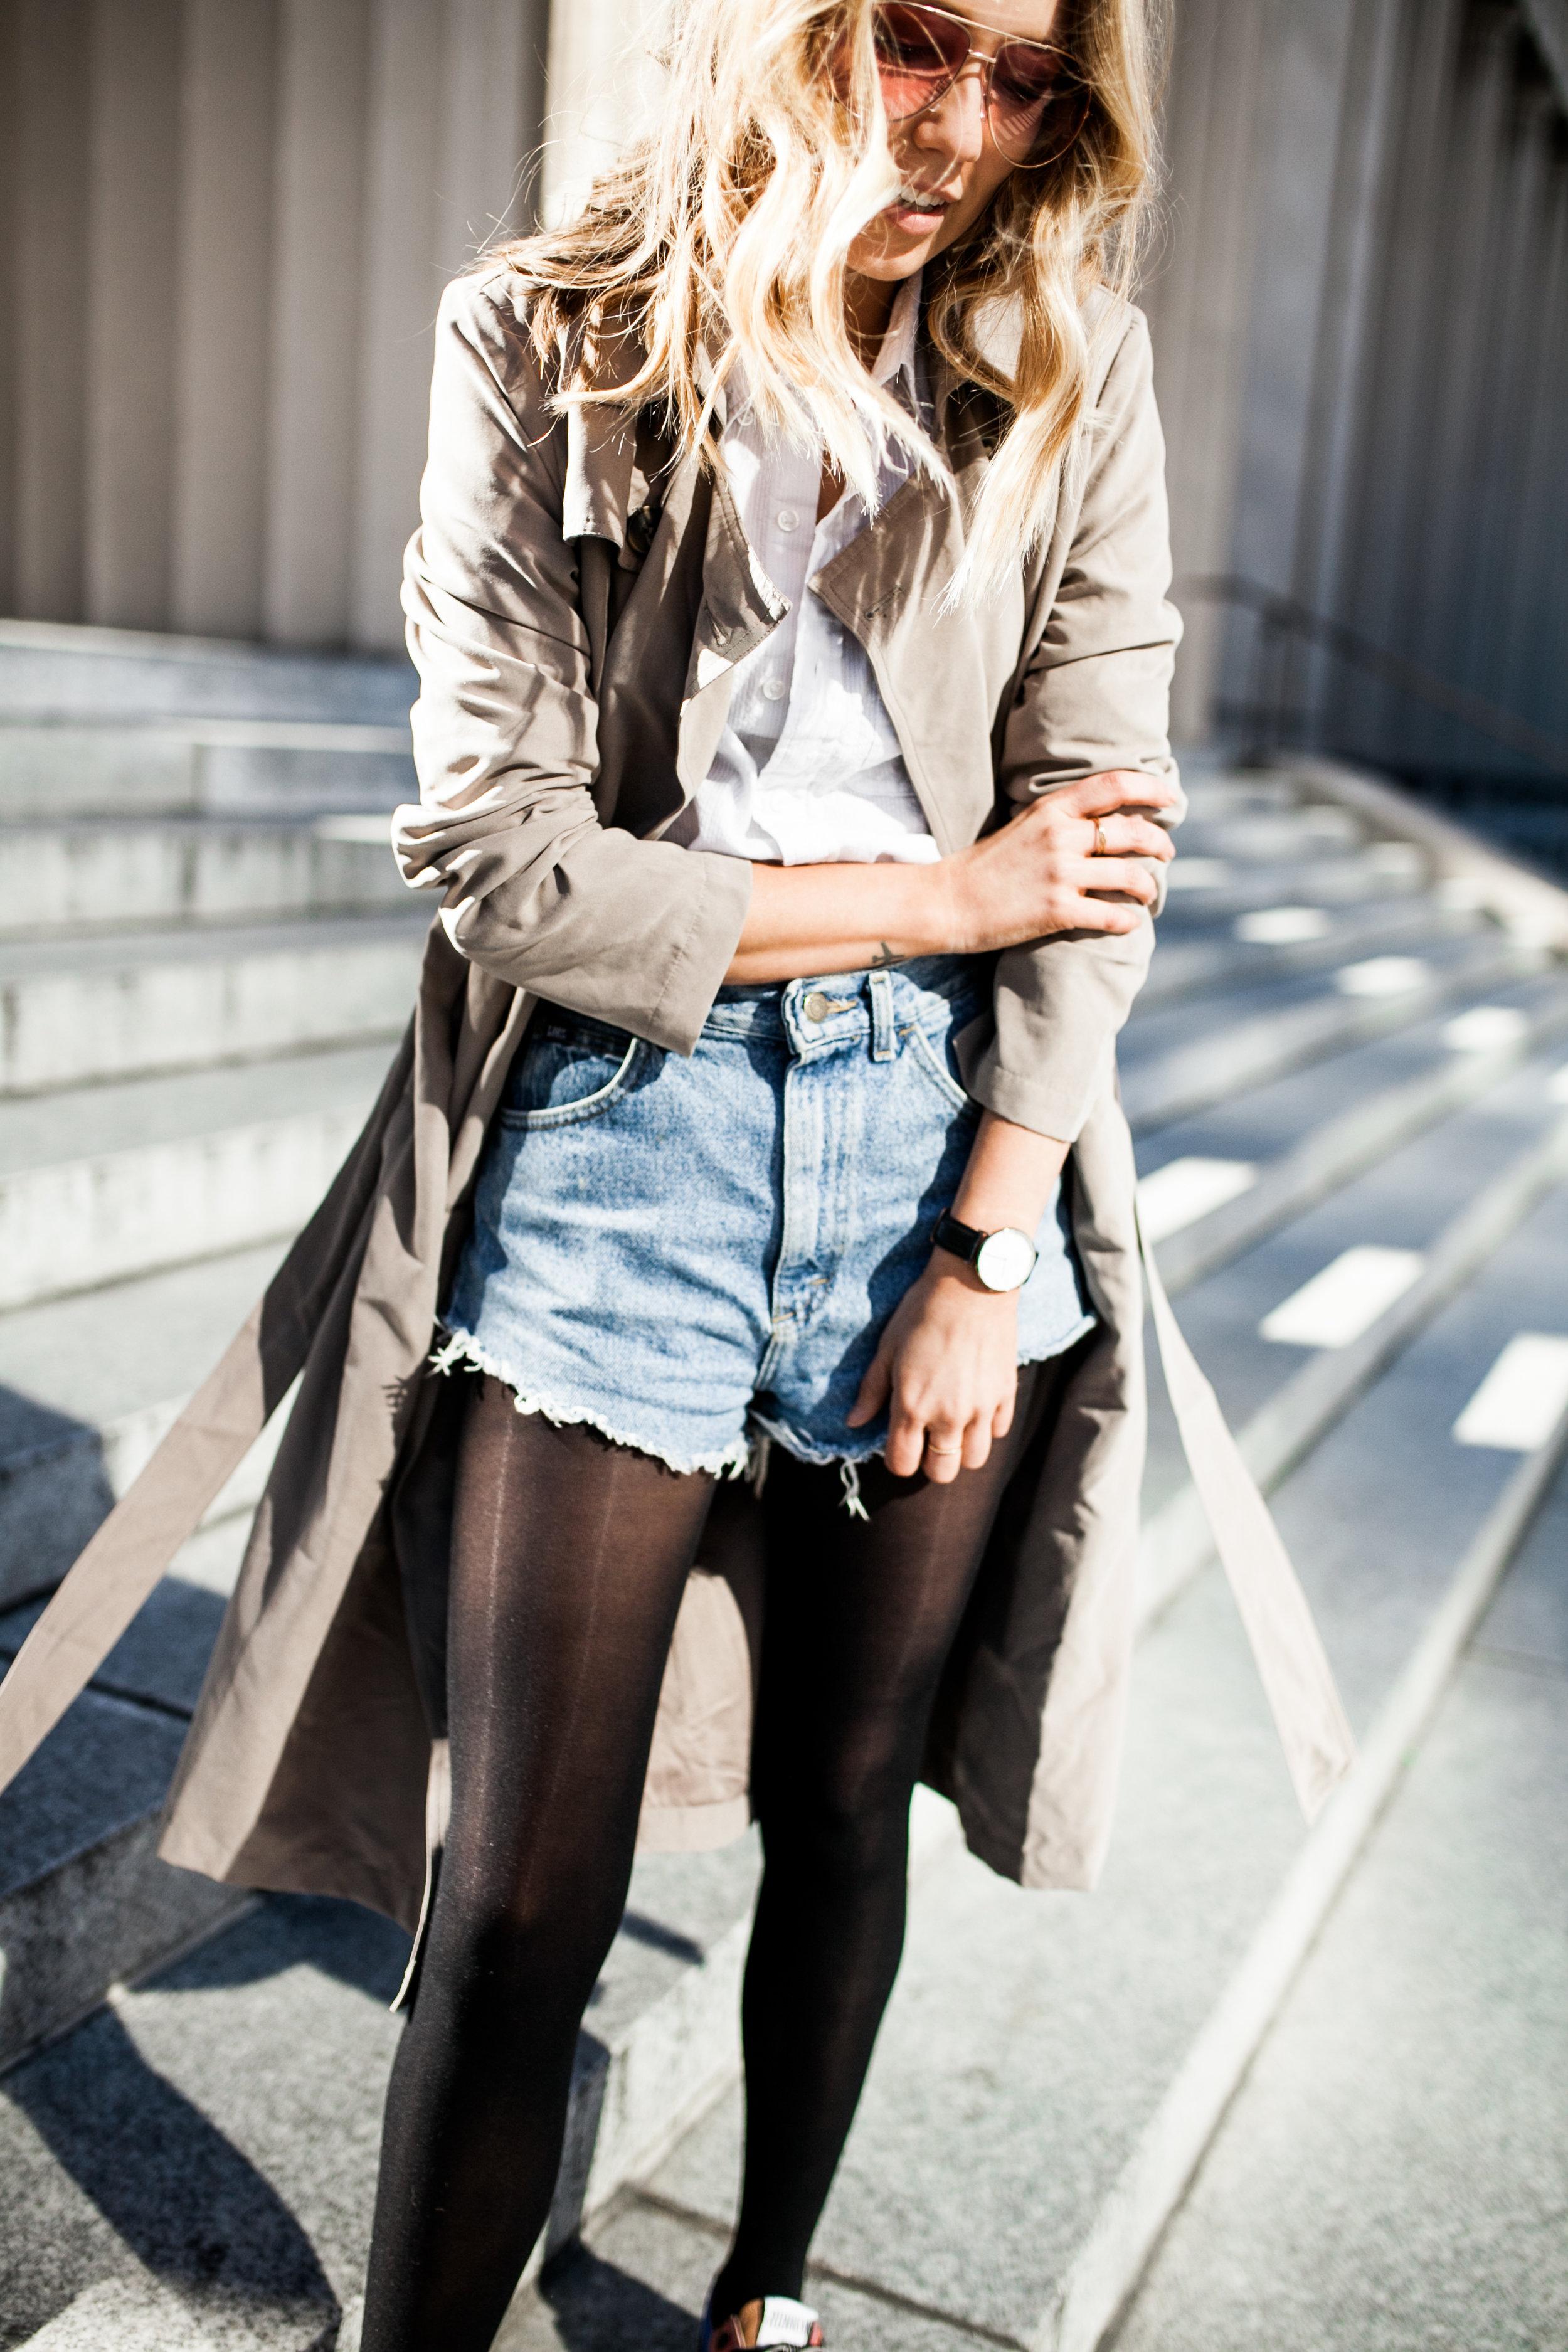 fashion blogger nashville style rose tinted sunglasses trnech coat cut off levis golden goose statement sneakers.jpg